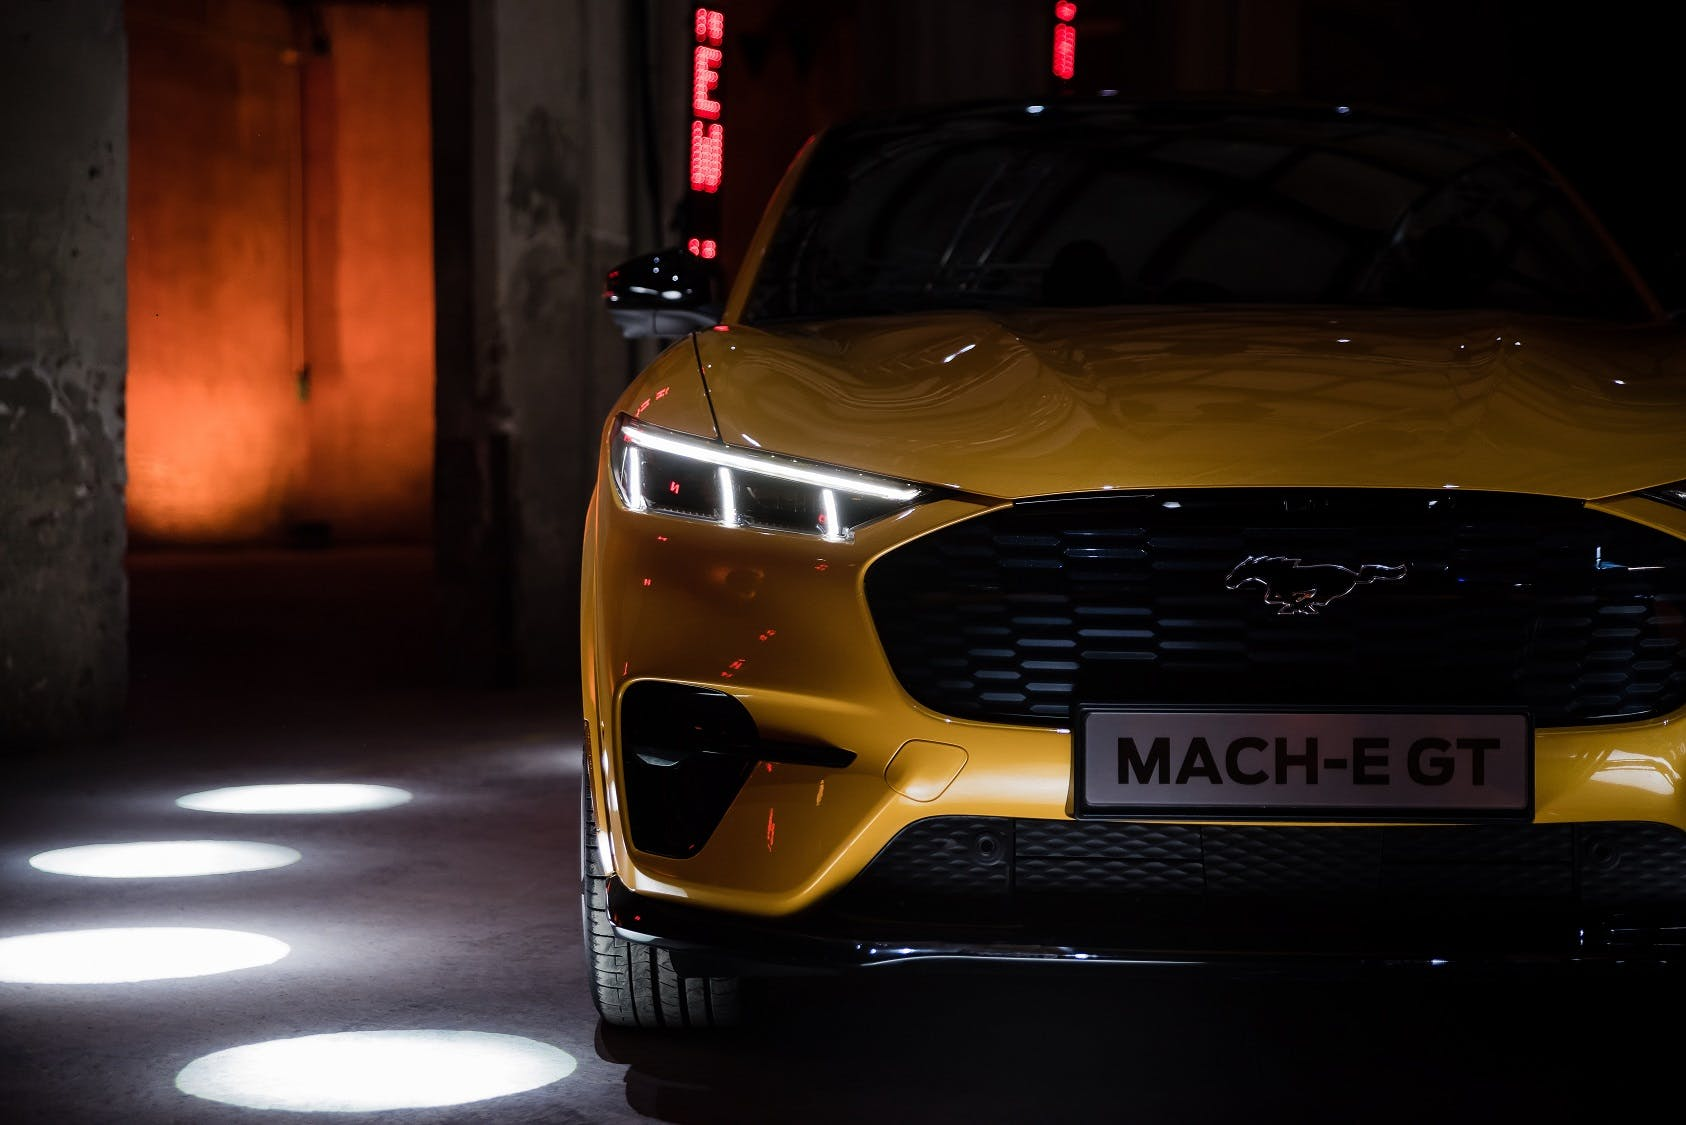 Ford Mustang Mach-e GT - dettaglio frontale